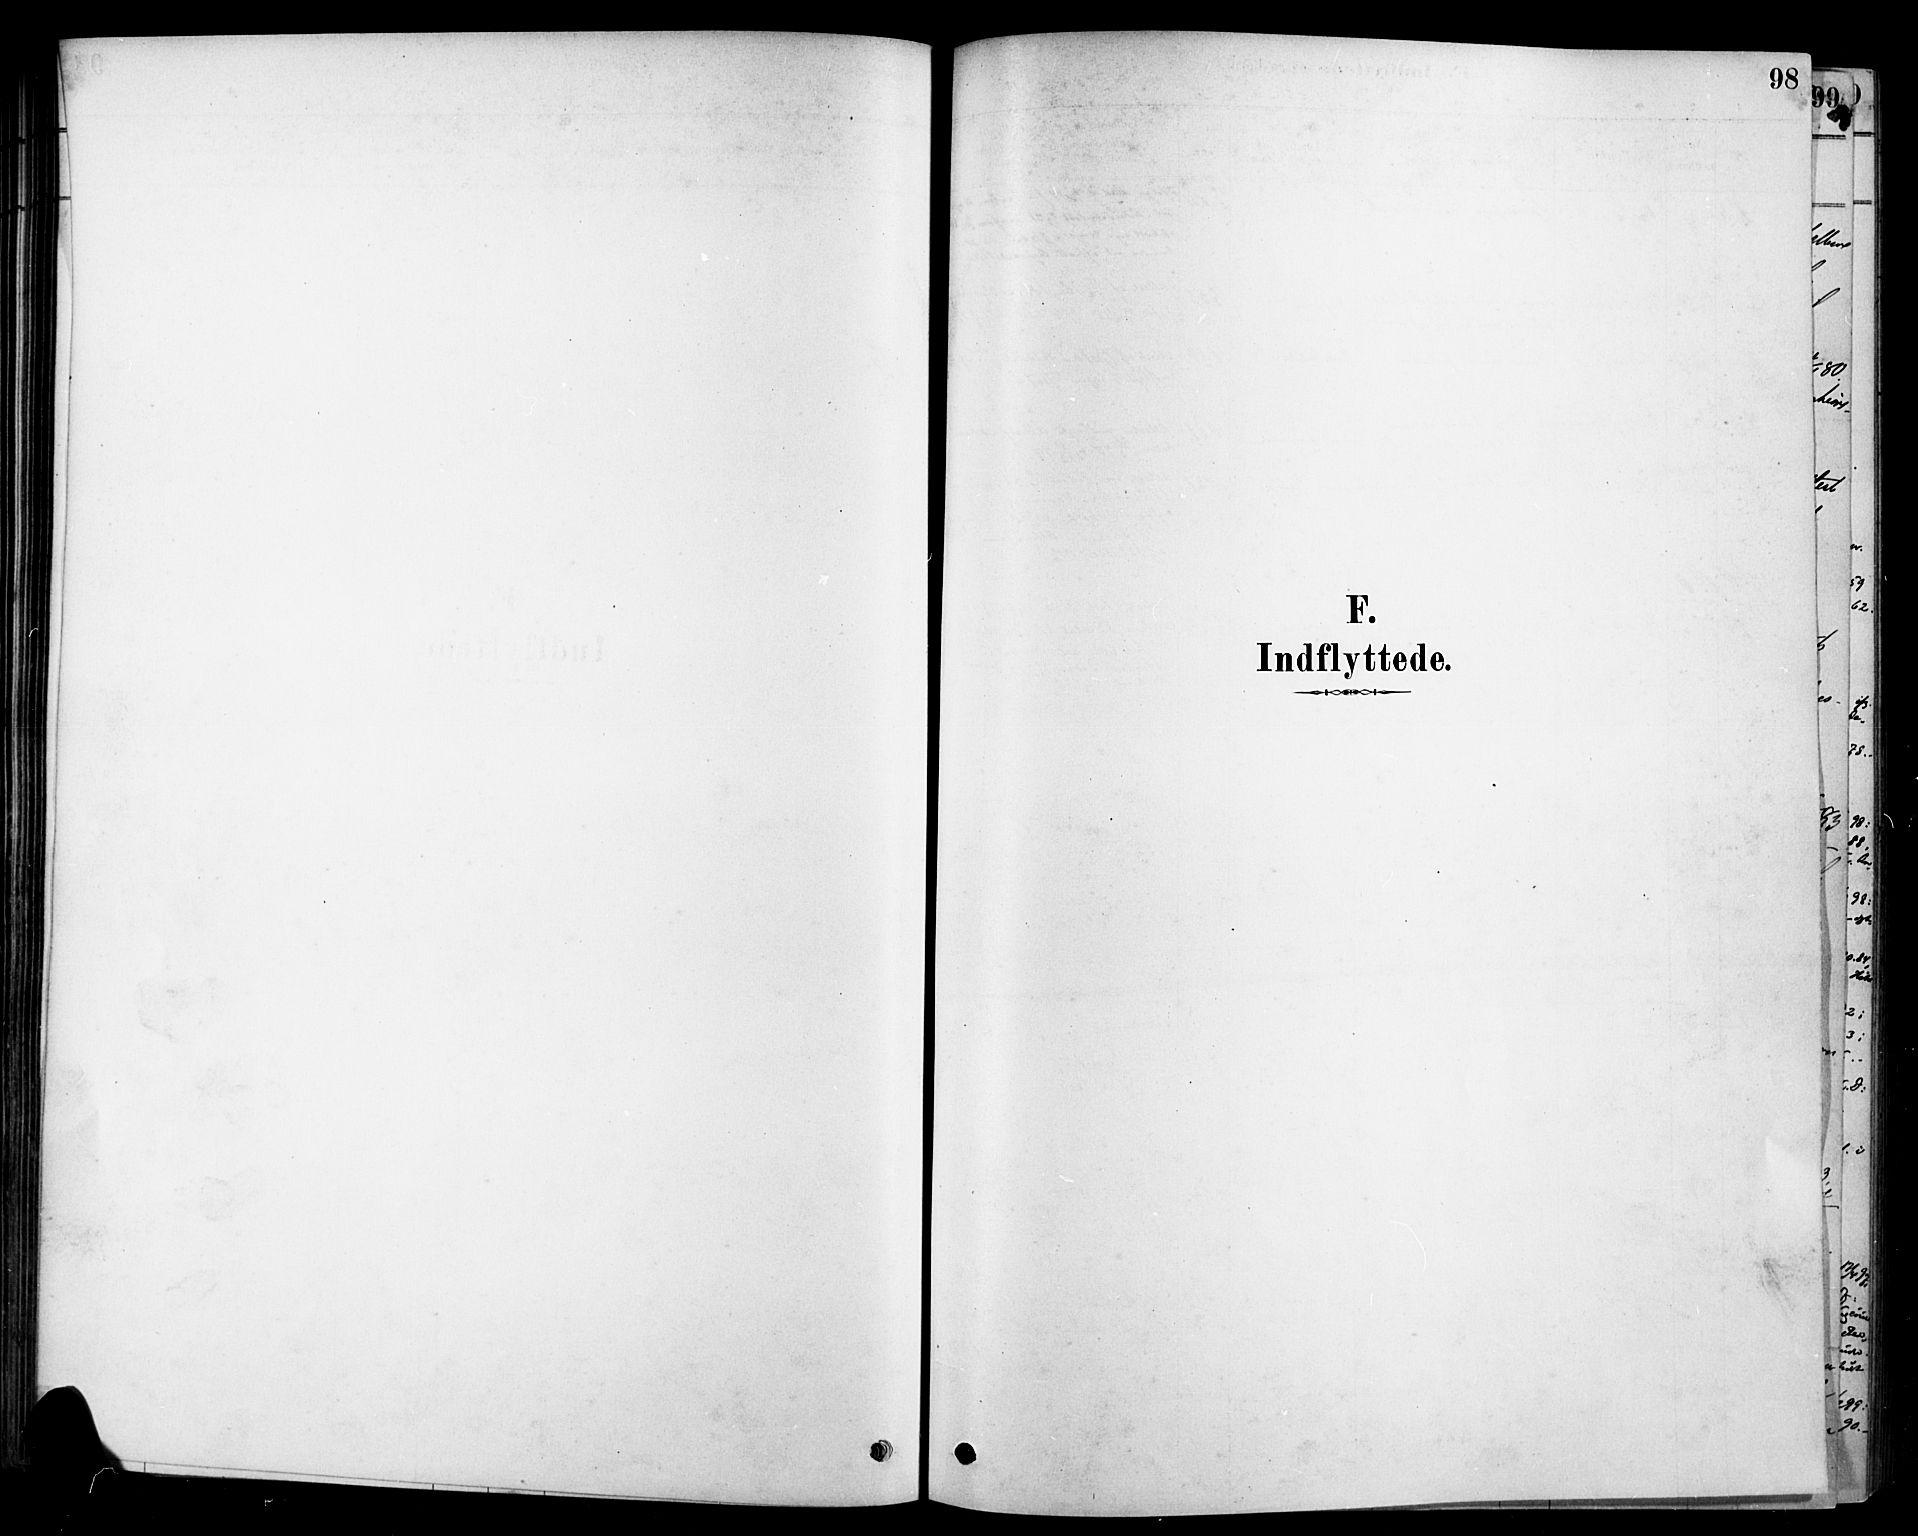 SAKO, Heddal kirkebøker, F/Fa/L0009: Parish register (official) no. I 9, 1878-1903, p. 98